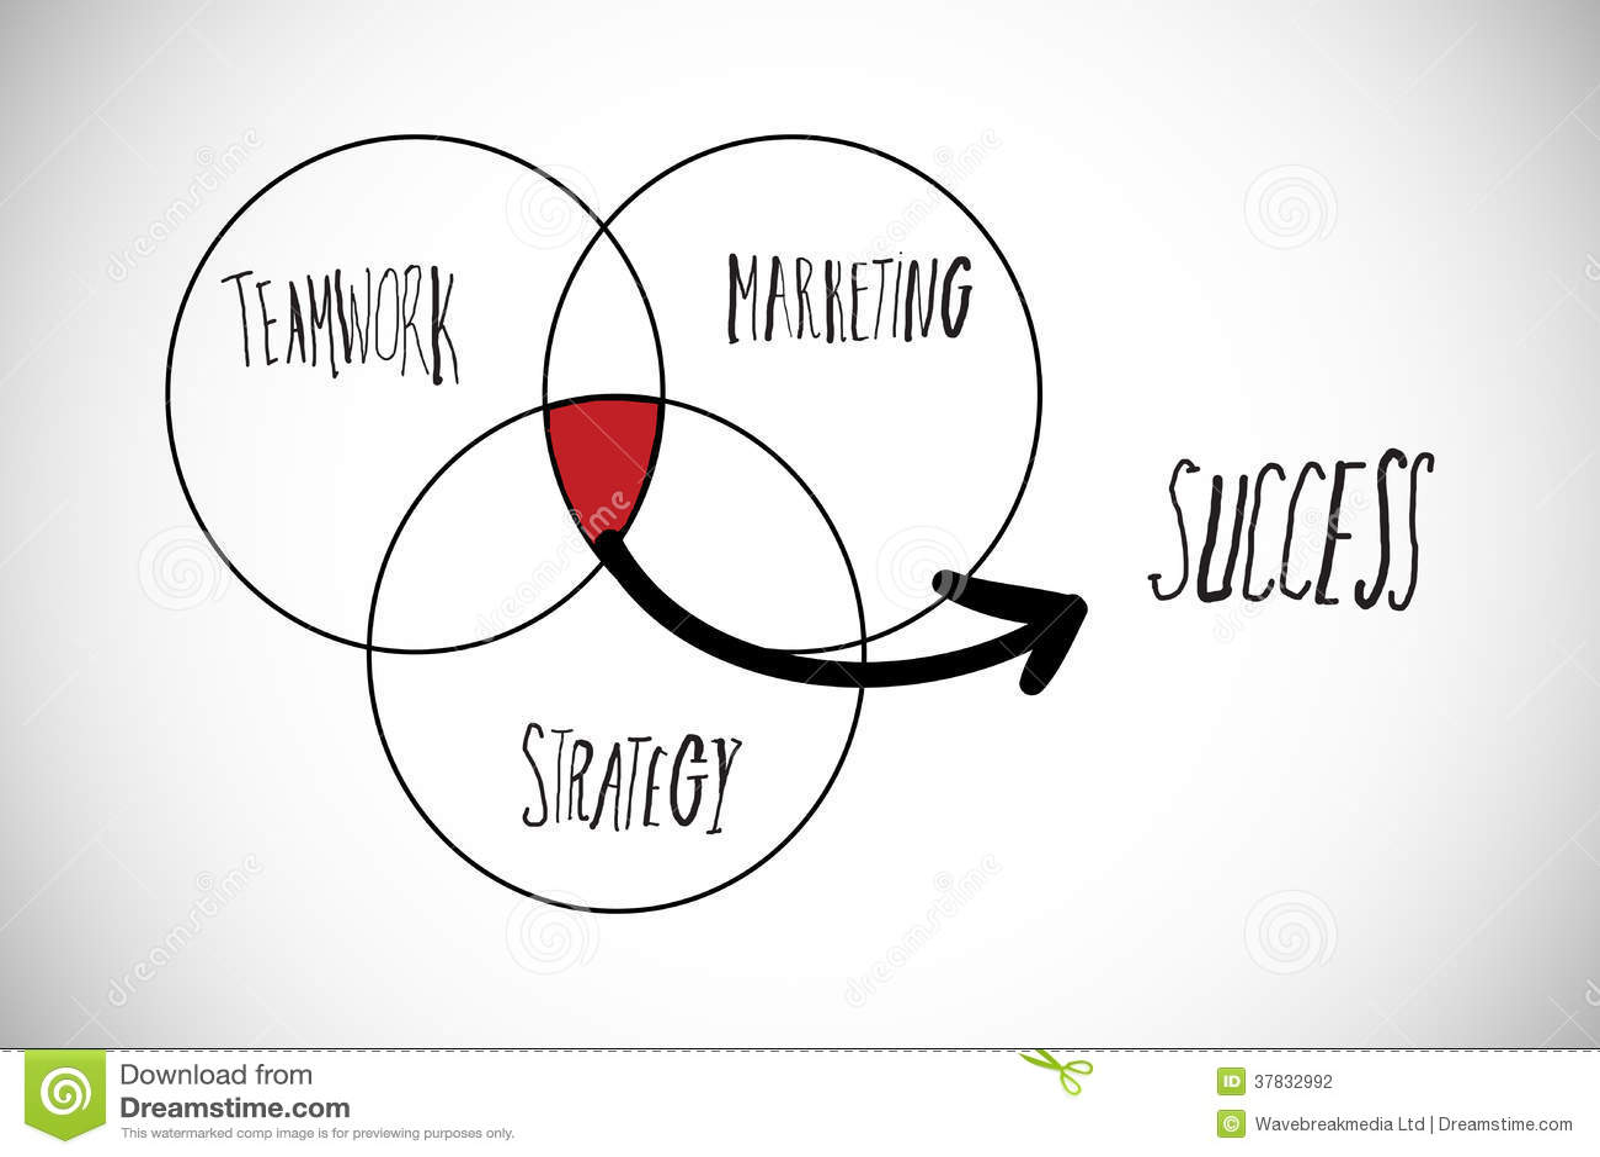 Composite image of success venn diagram stock illustration composite image of success venn diagram ccuart Choice Image